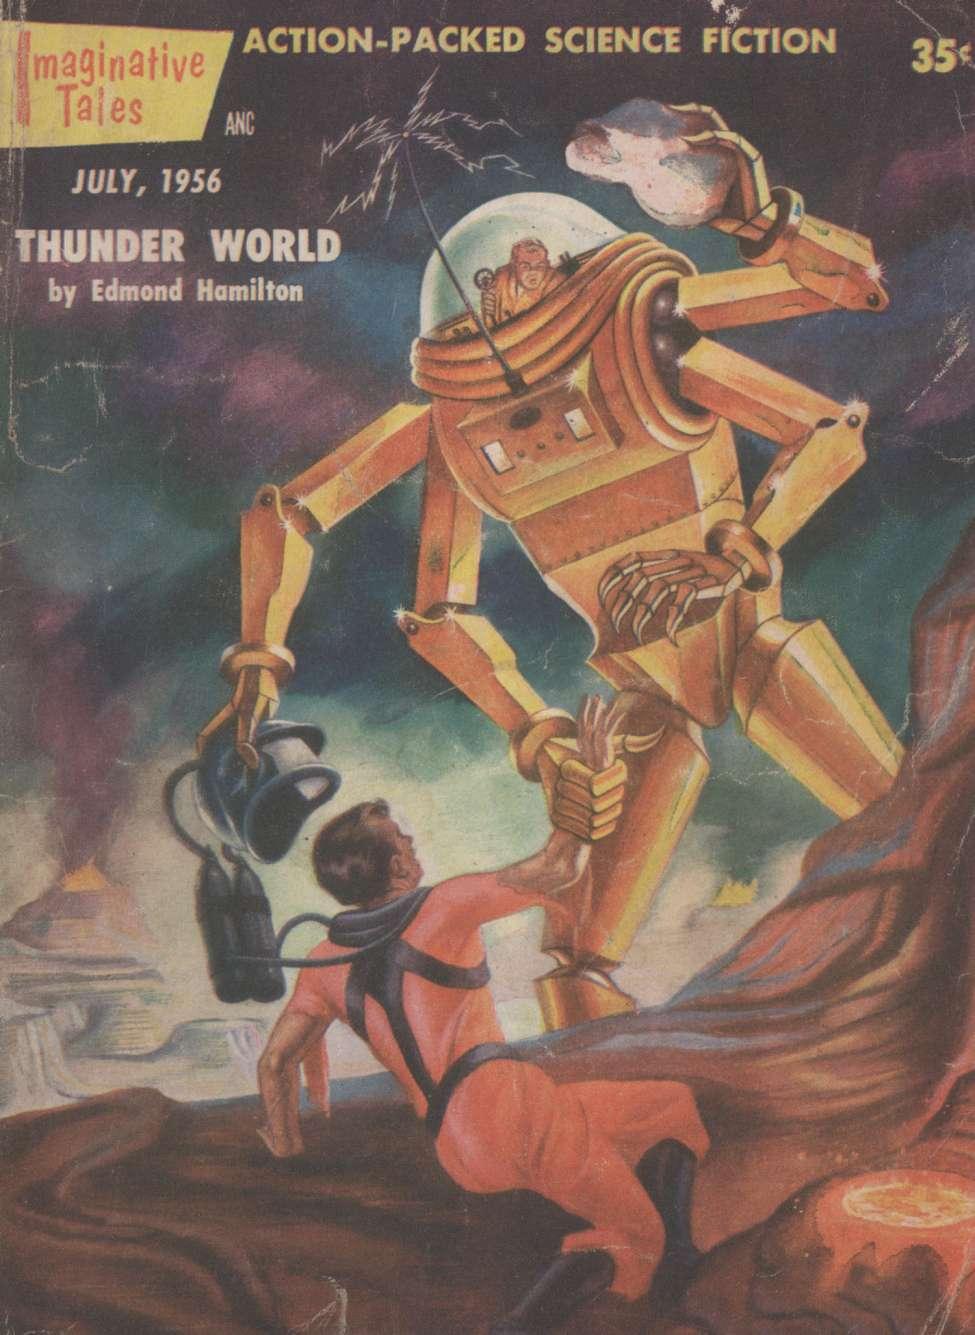 Comic Book Cover For Imaginative Tales v03 04 - Thunder World - Edmond Hamilton